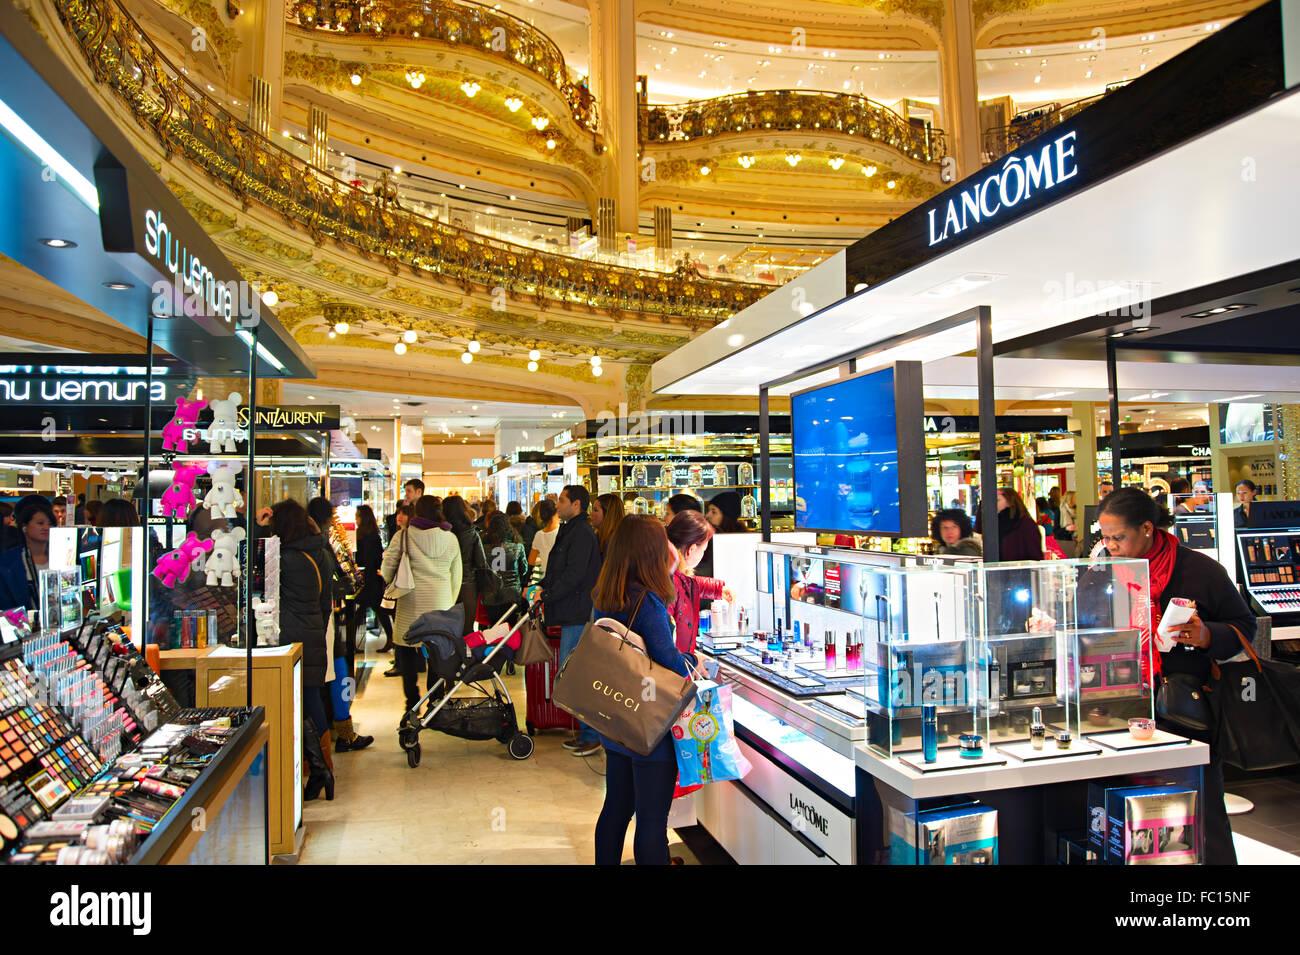 Lafayette luxury mall, Paris - Stock Image